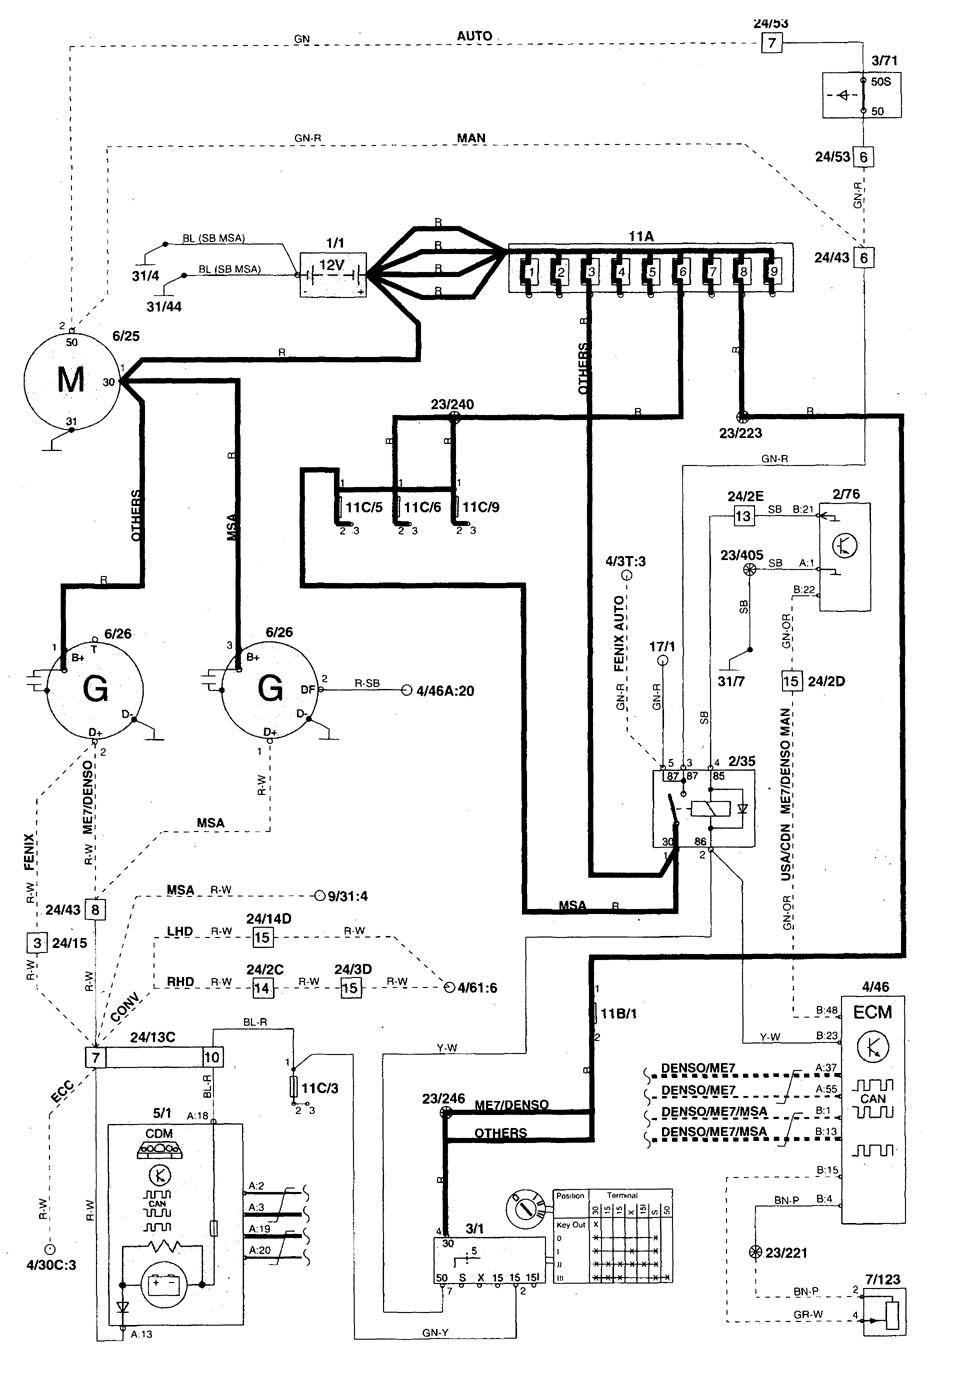 medium resolution of likewise volvo wiring diagram fh 16 638 likewise furthermore furthermore 4 3gi volvo wiring diagram 26